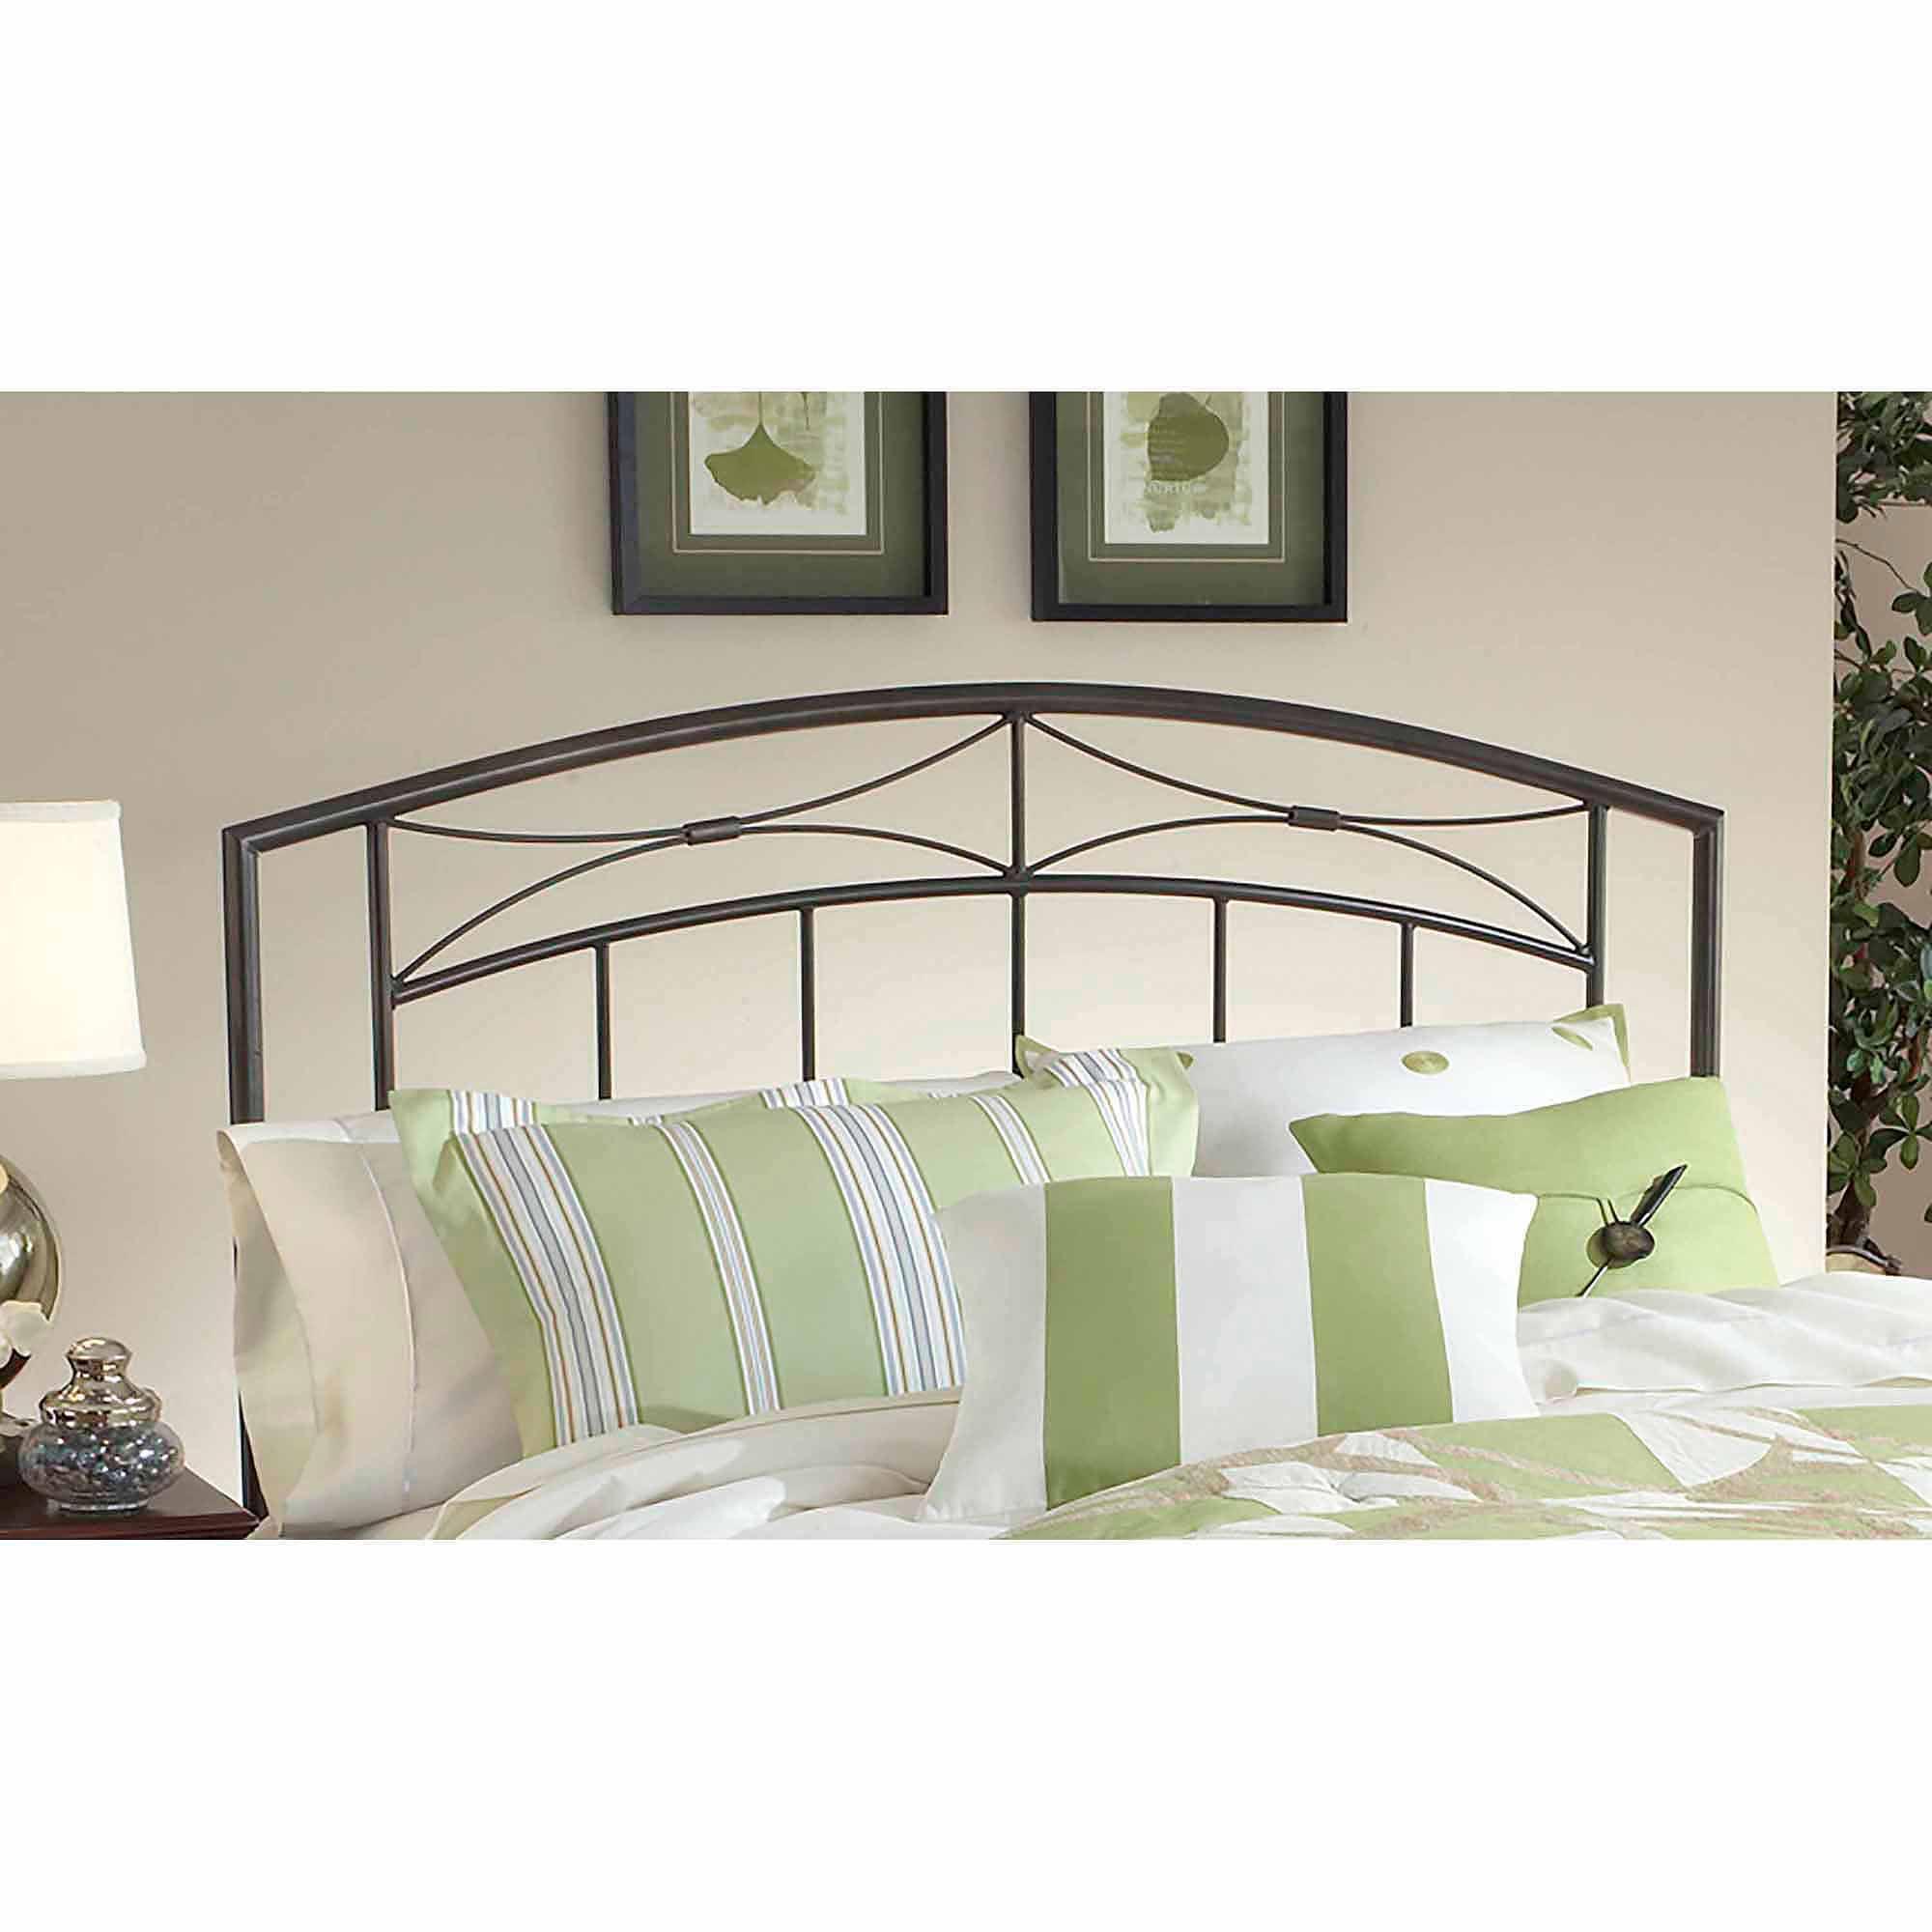 Hillsdale Furniture Morris Headboard, Full/Queen, Magnesium Pewter -Component